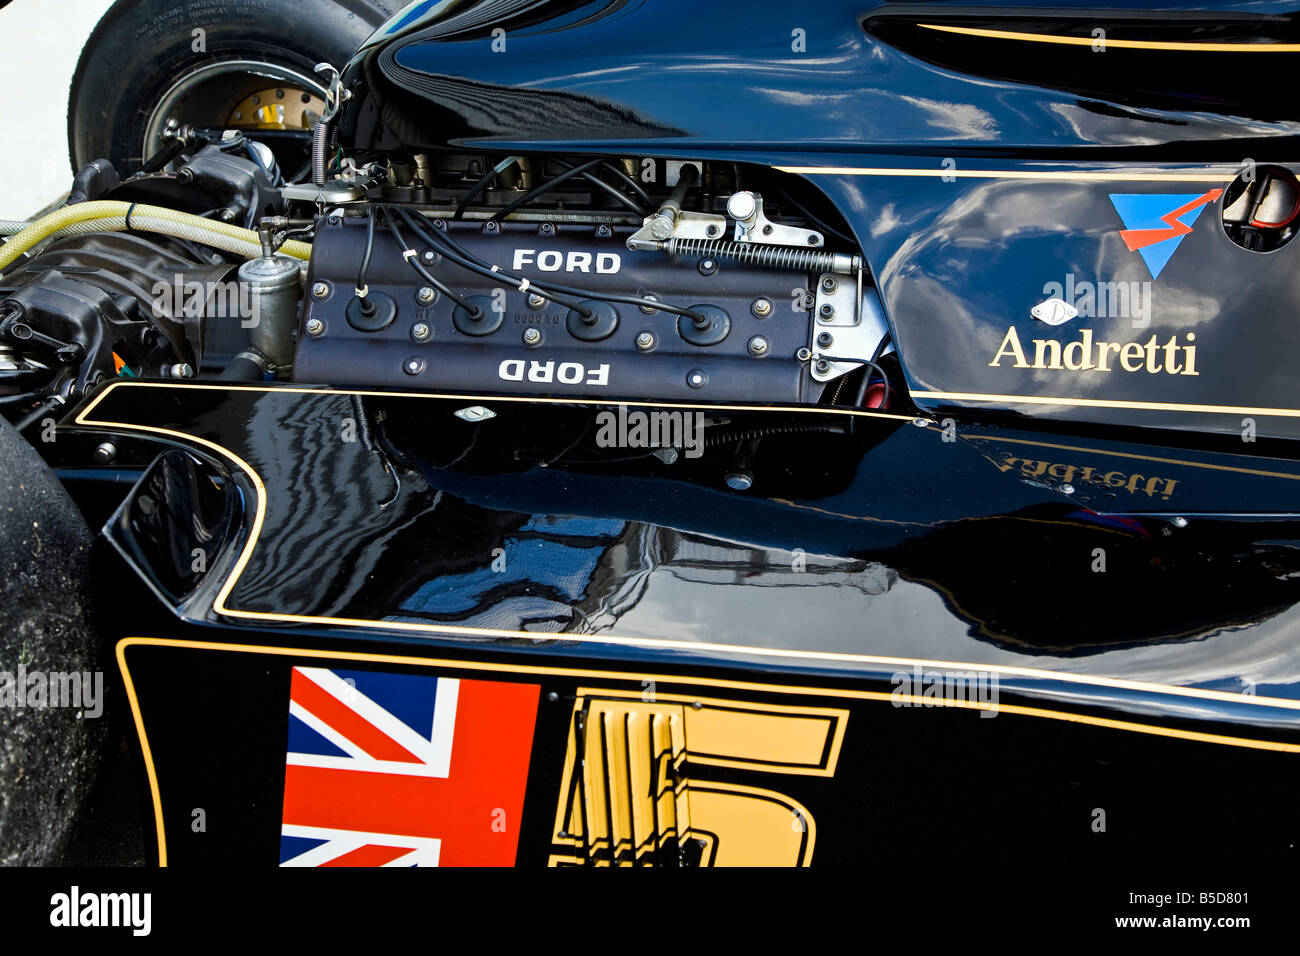 Ford F1 Engine On A Historic Lotus 77 Formula 1 Grand Prix